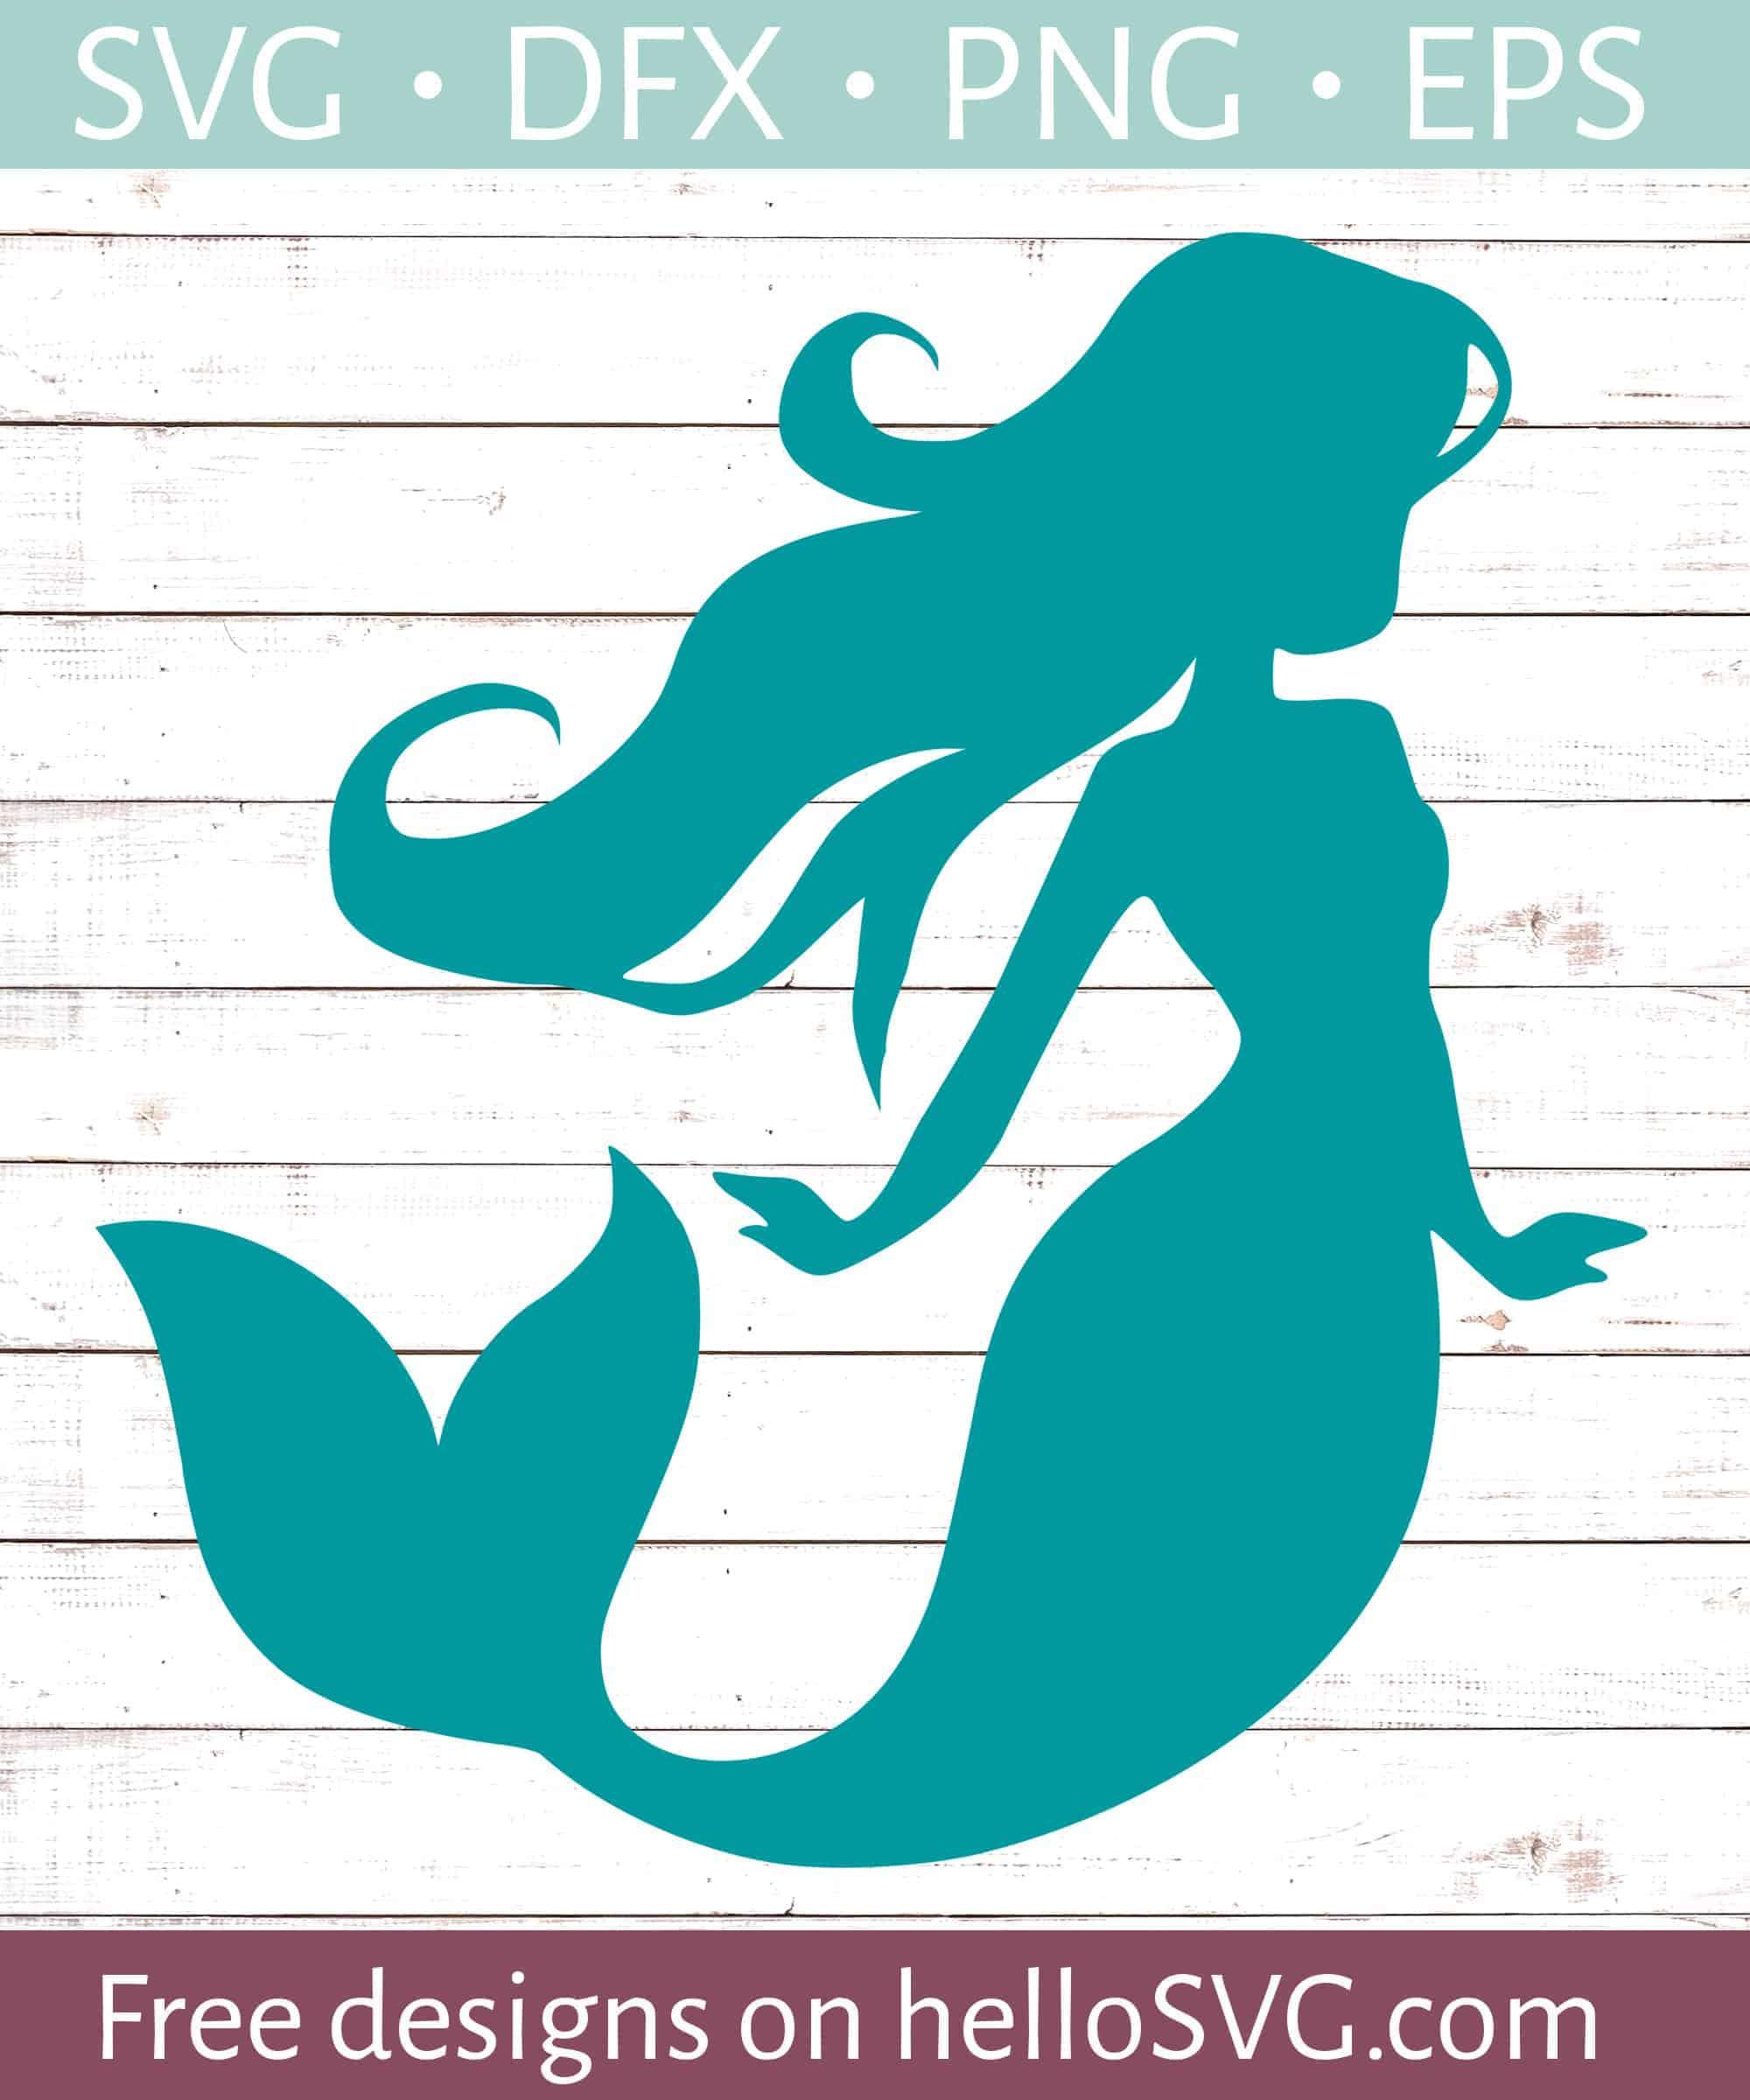 Mermom svg,png,jpg,dxf Mermaid cut file,birthday mermaid,mermaid instant download cutting file,silhouette cricut cut,free commercial use